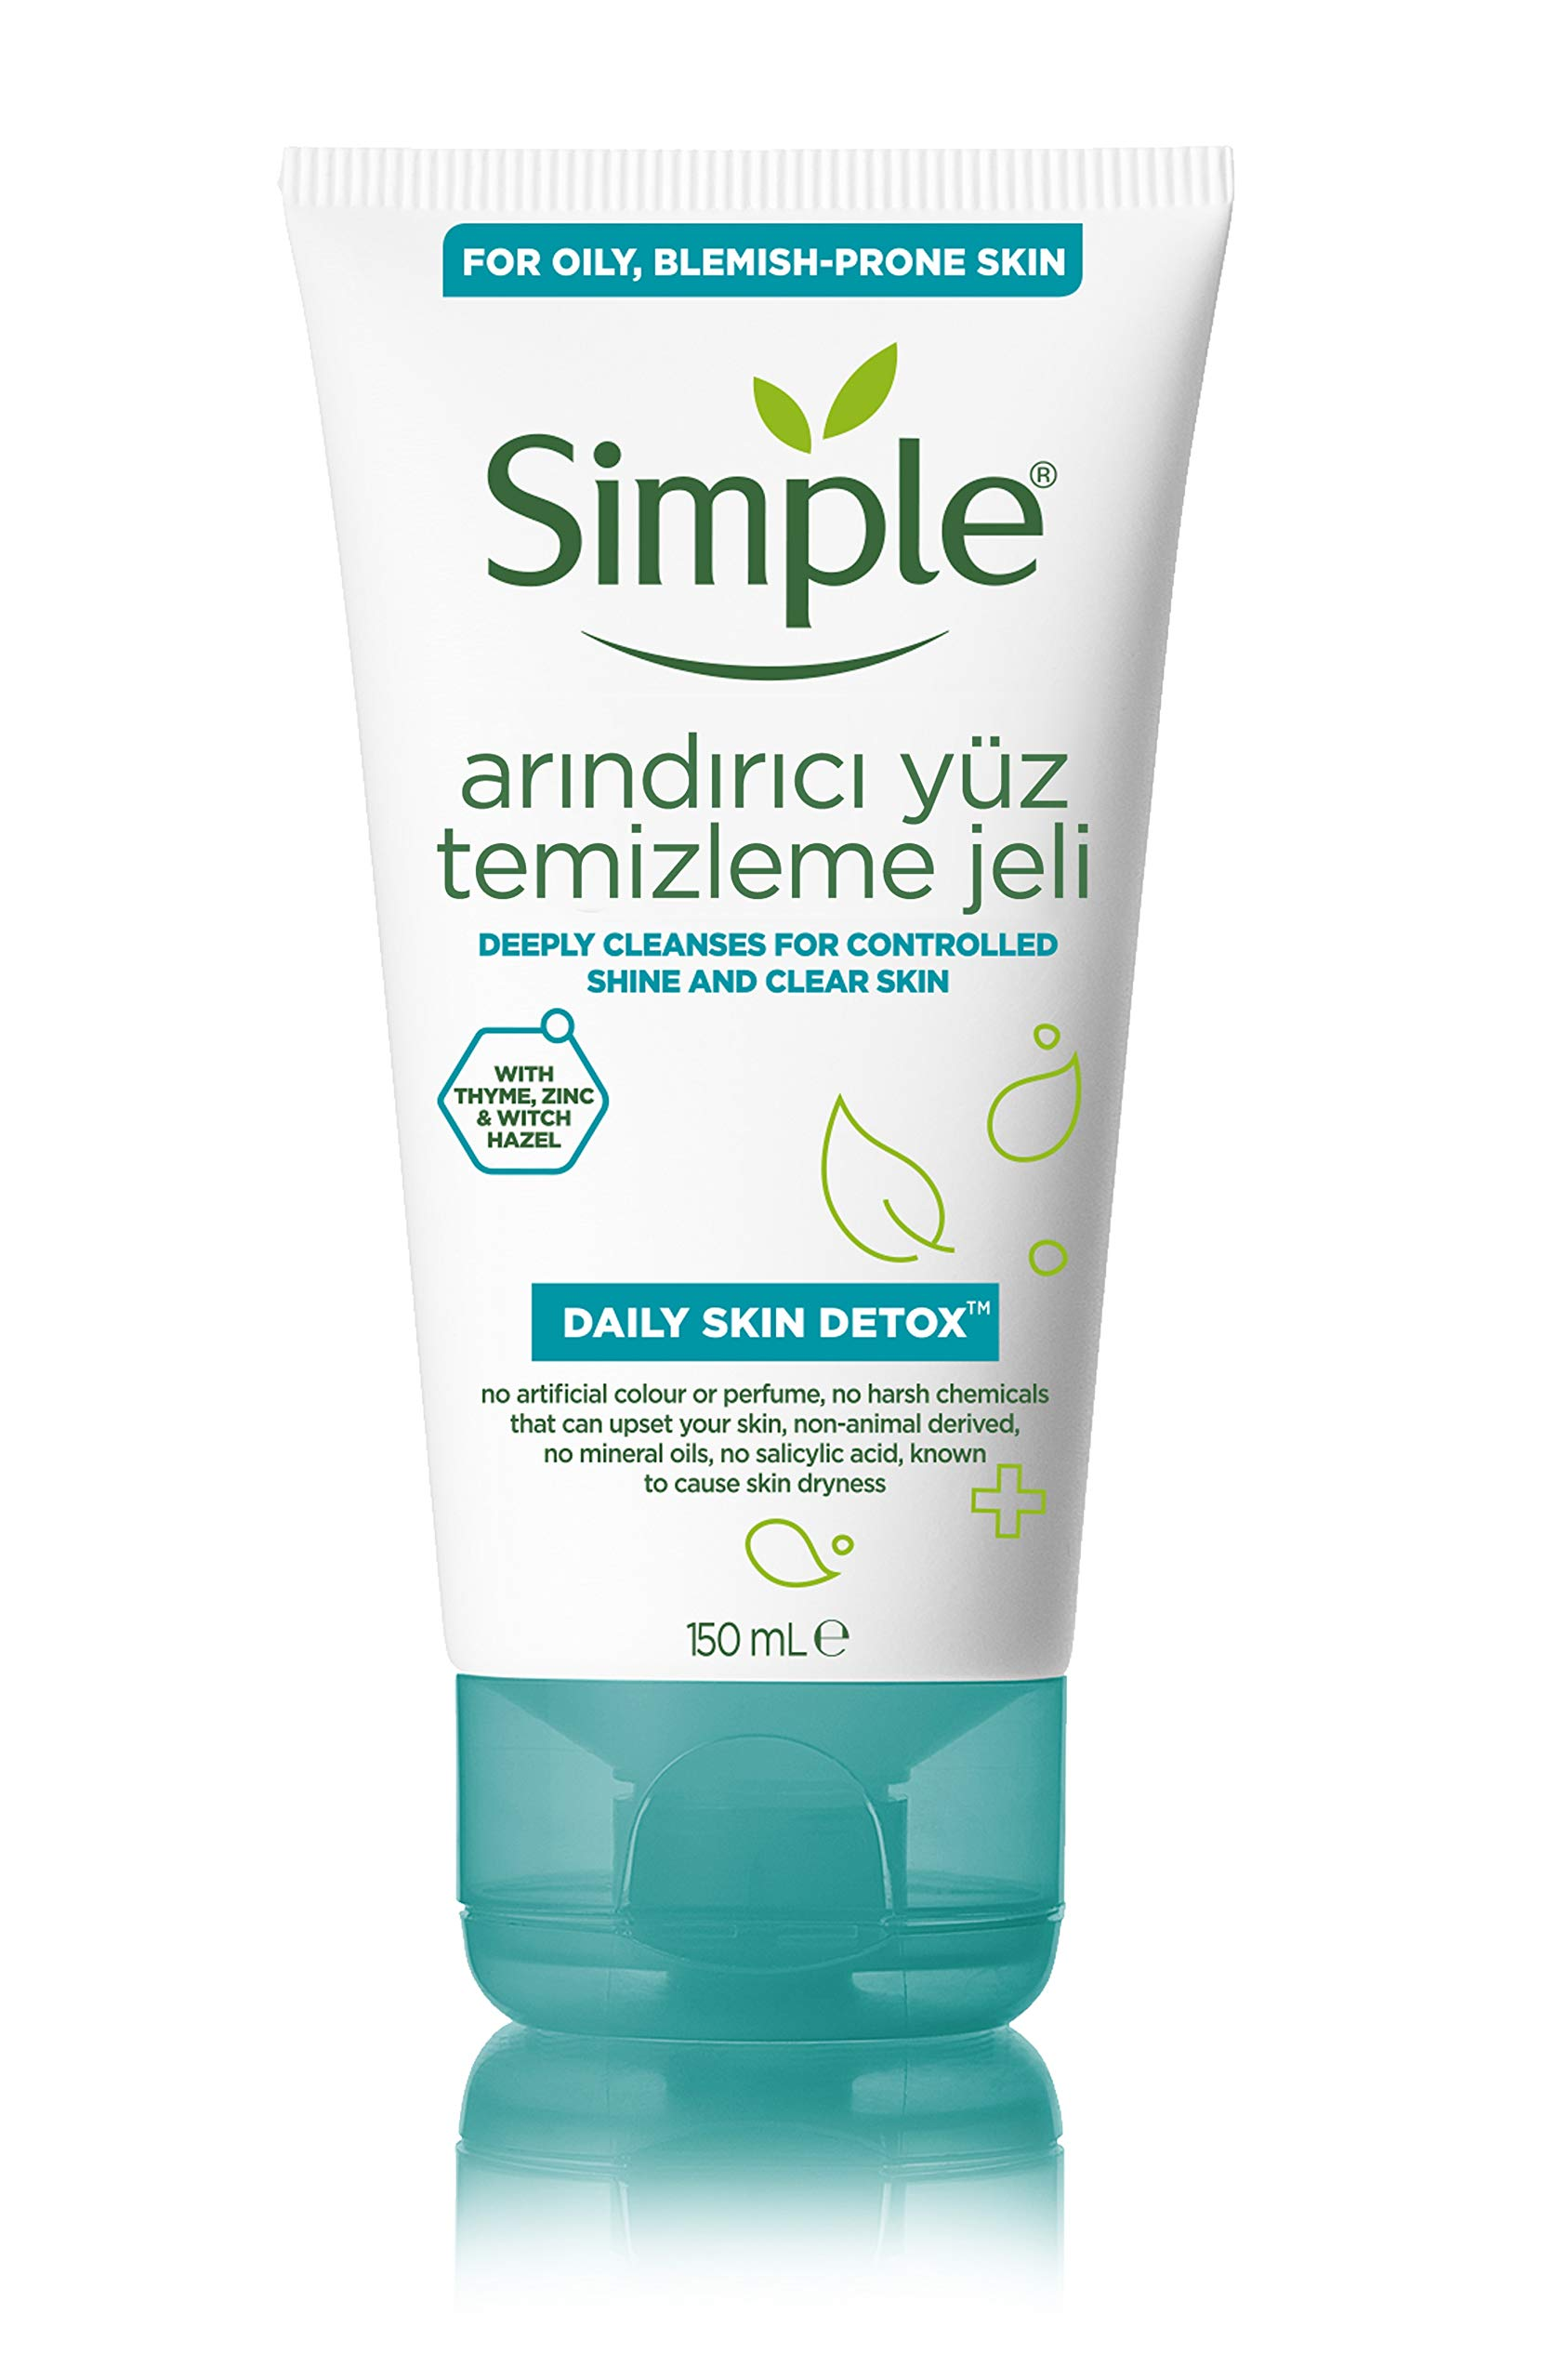 Simple Daily Skin Detox Purifying Facial Wash, 150ml